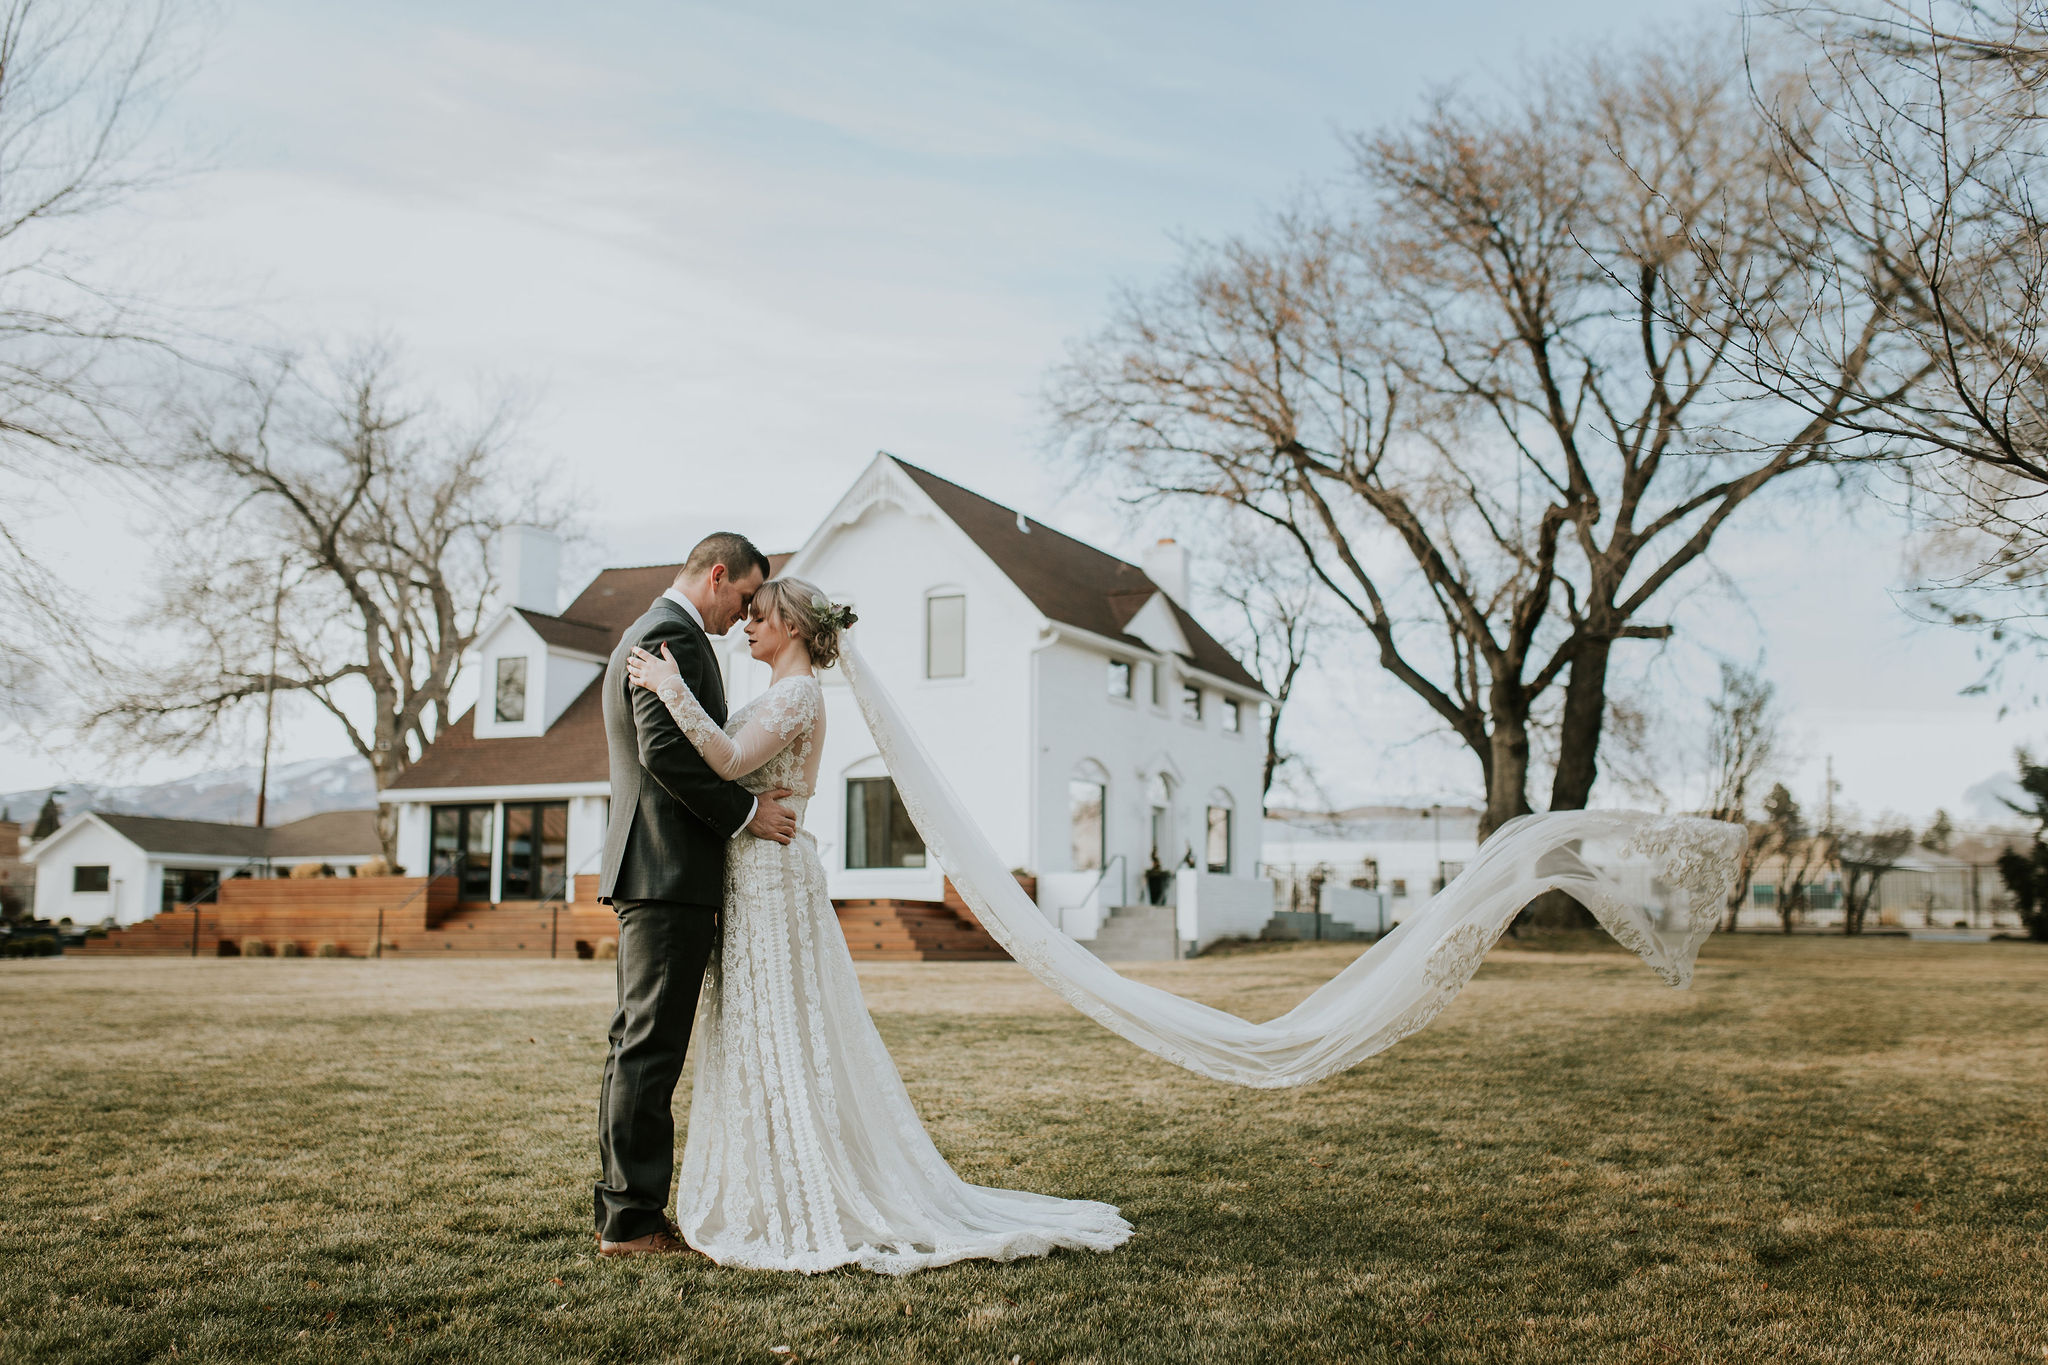 Wedding Planning While Quarantined